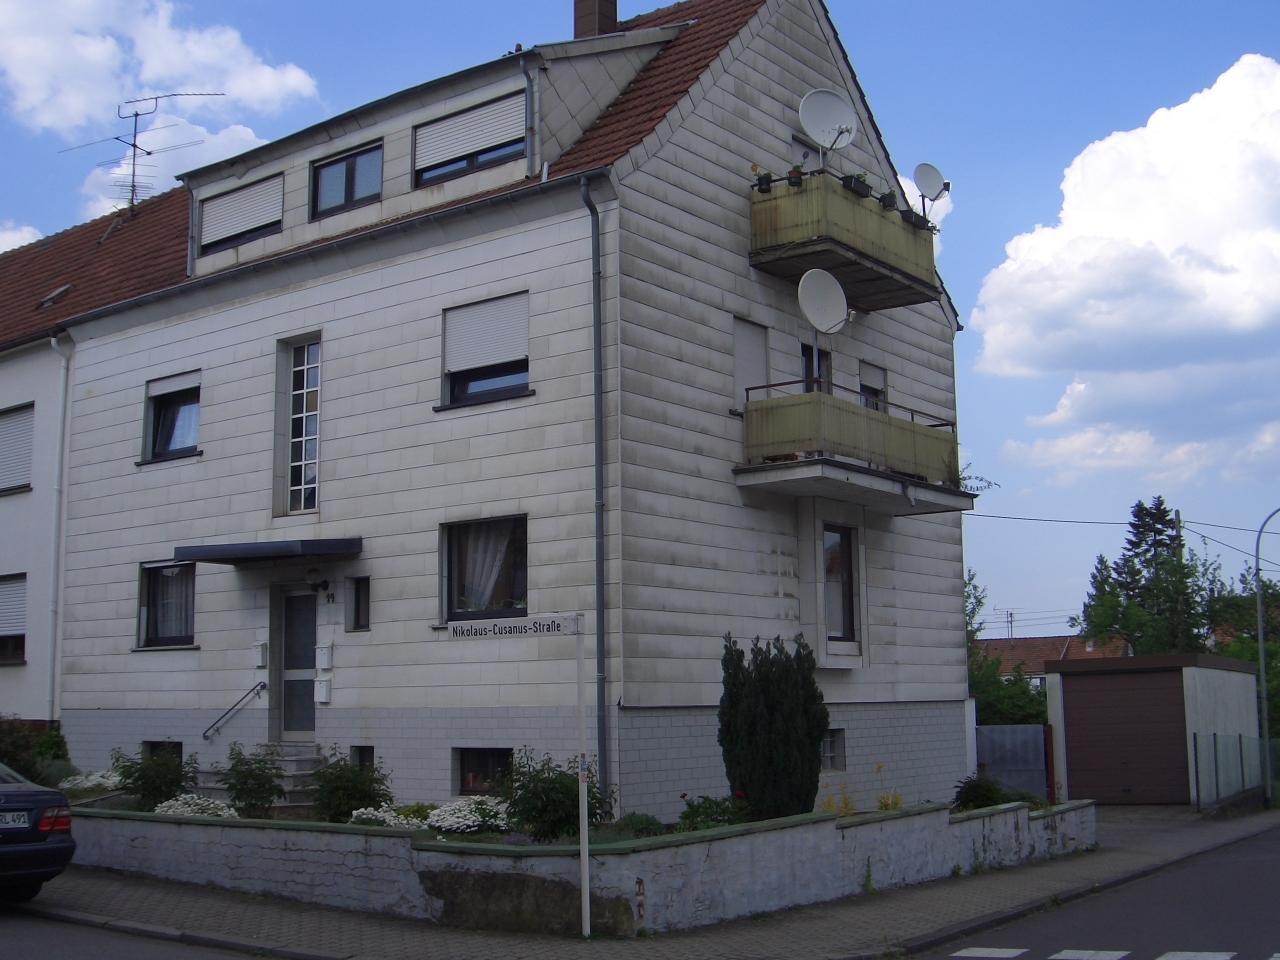 Osbild-House  12.08.2018 -  D-66740 Saarlouis, - 2 Appartemen for 8 poeple